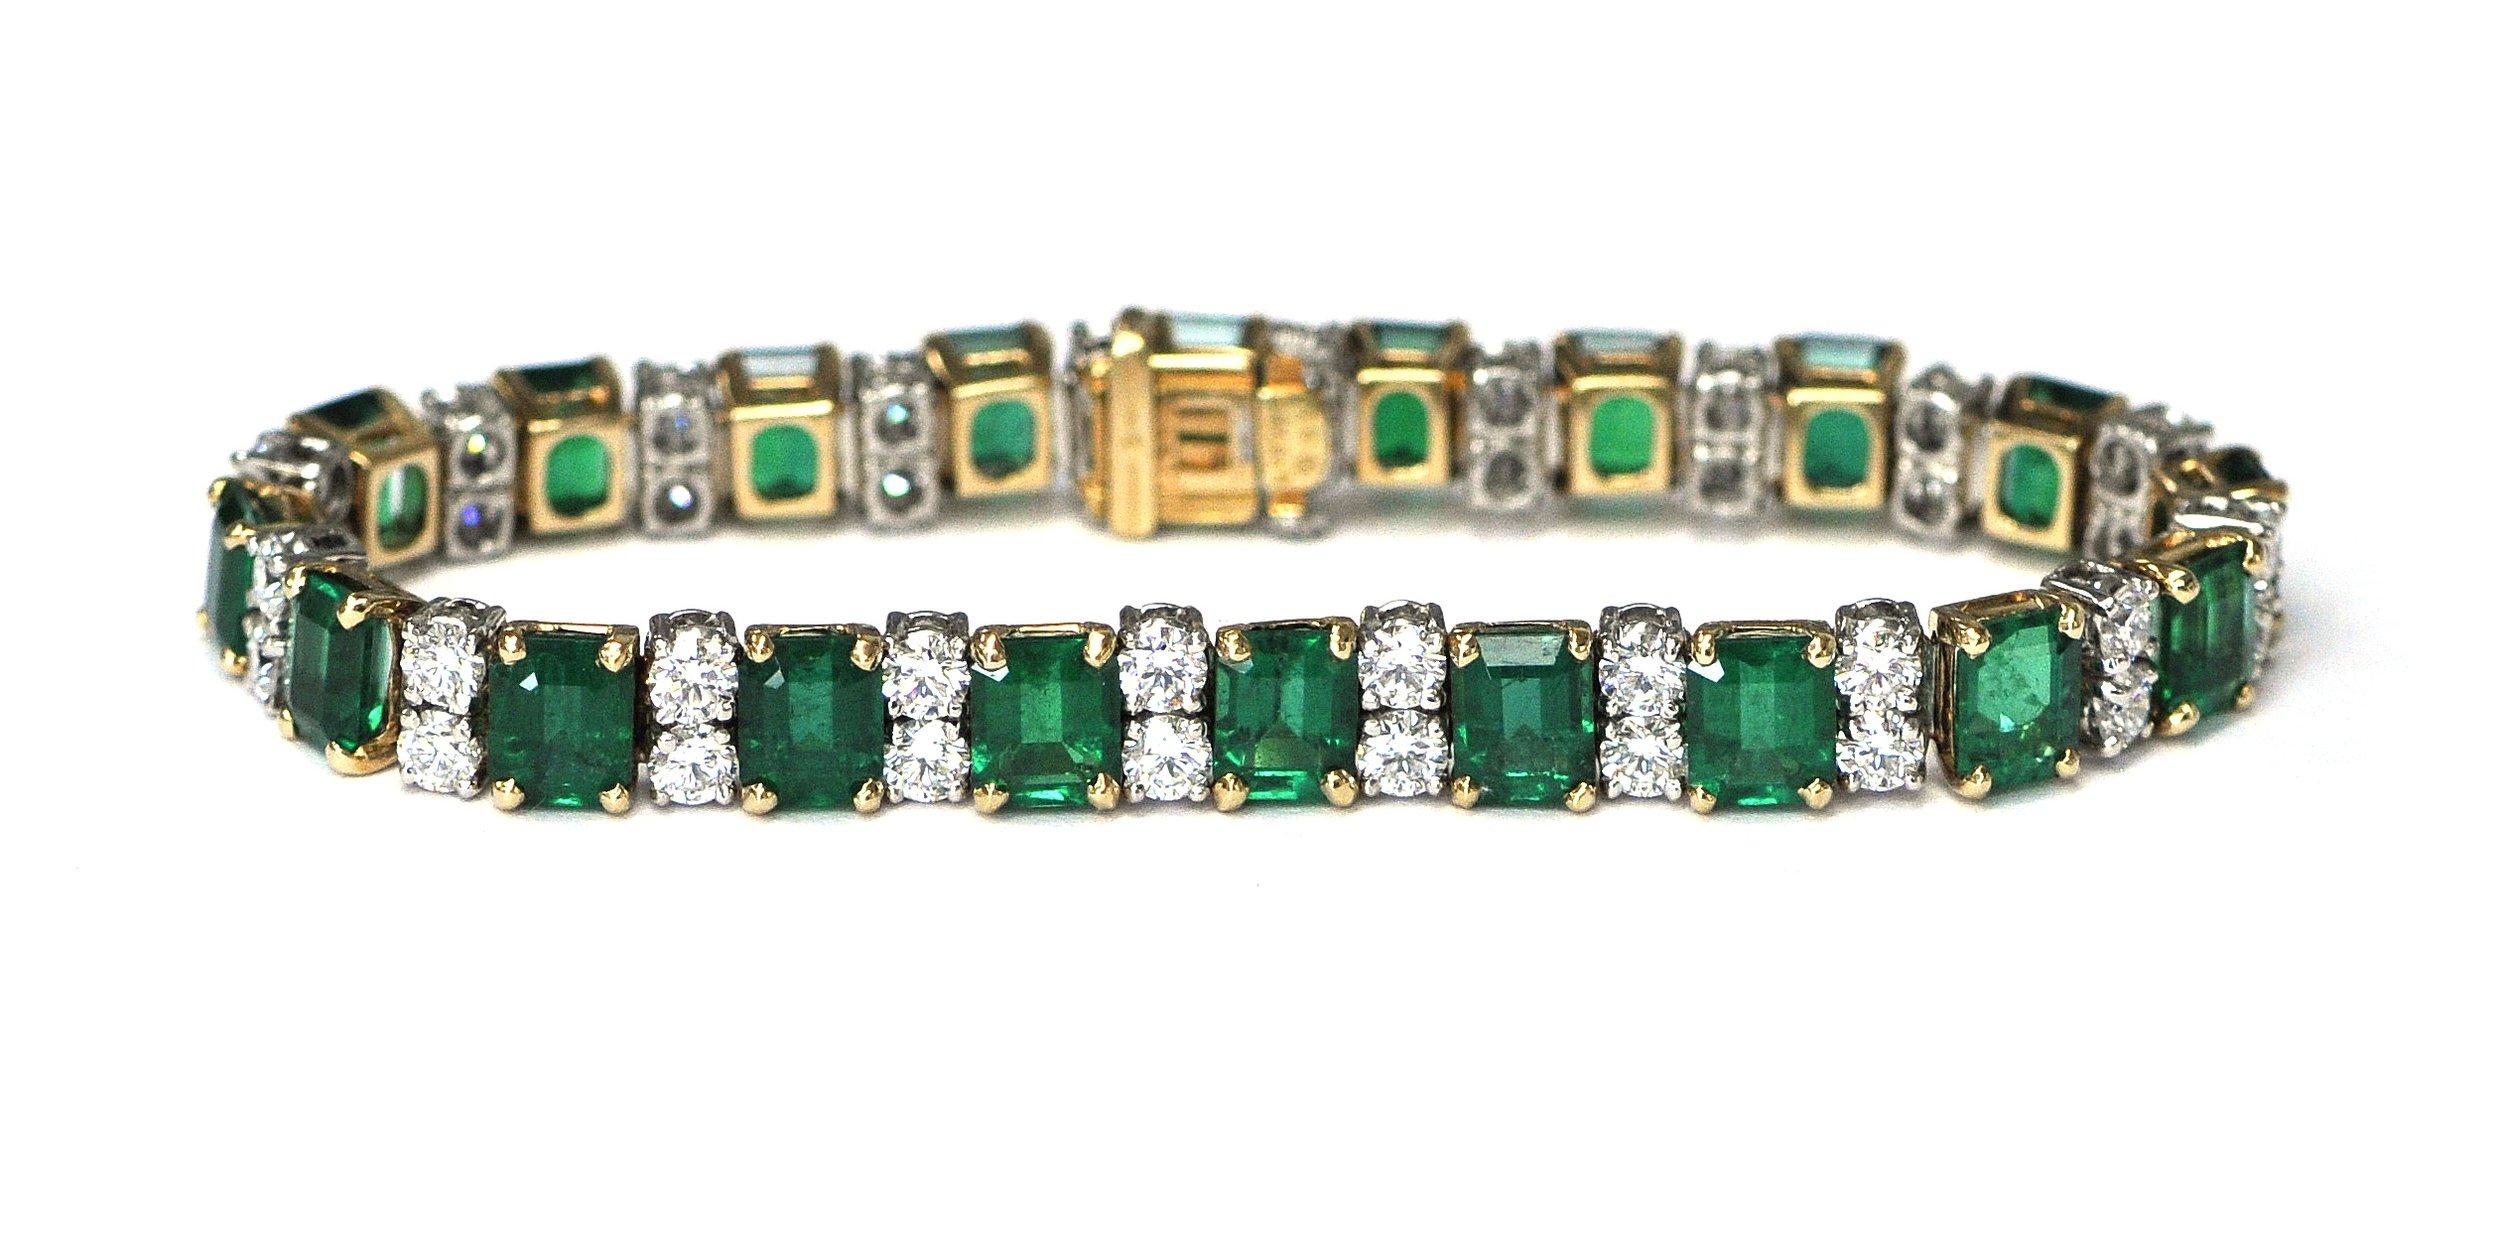 16ct Emerald & Diamond Heyman Bracelet